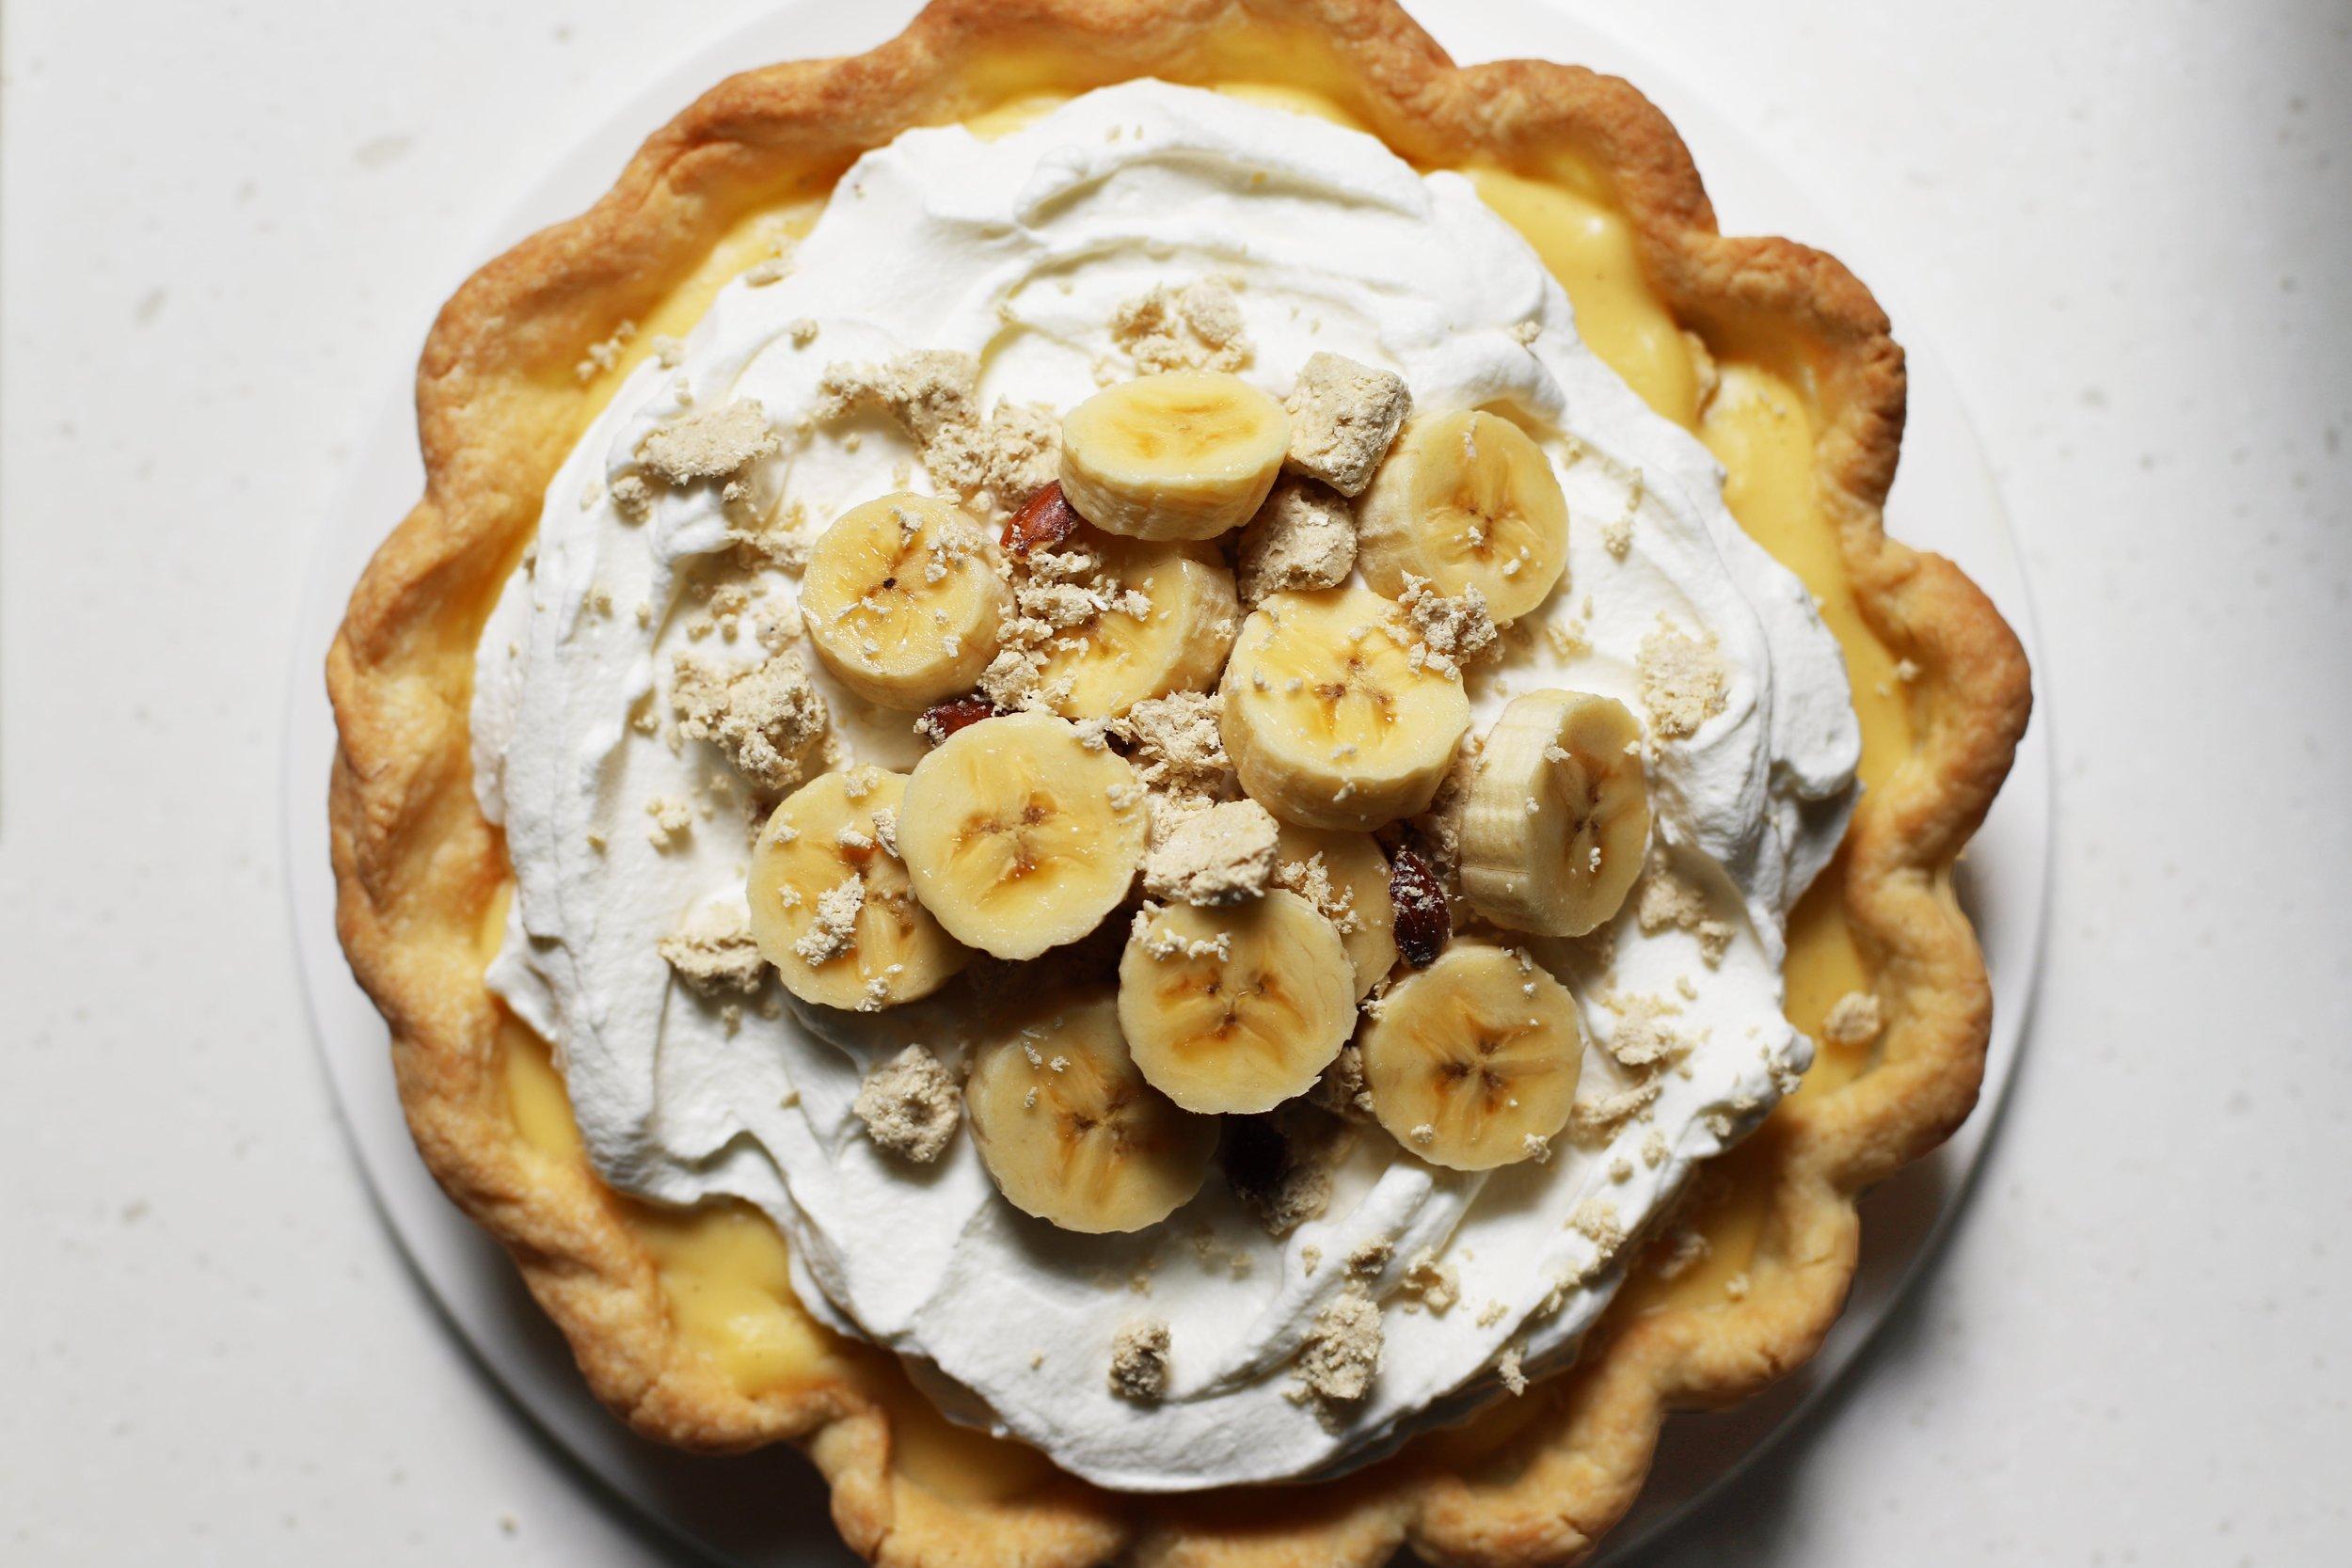 banana cream pie w/ halva and cardamom